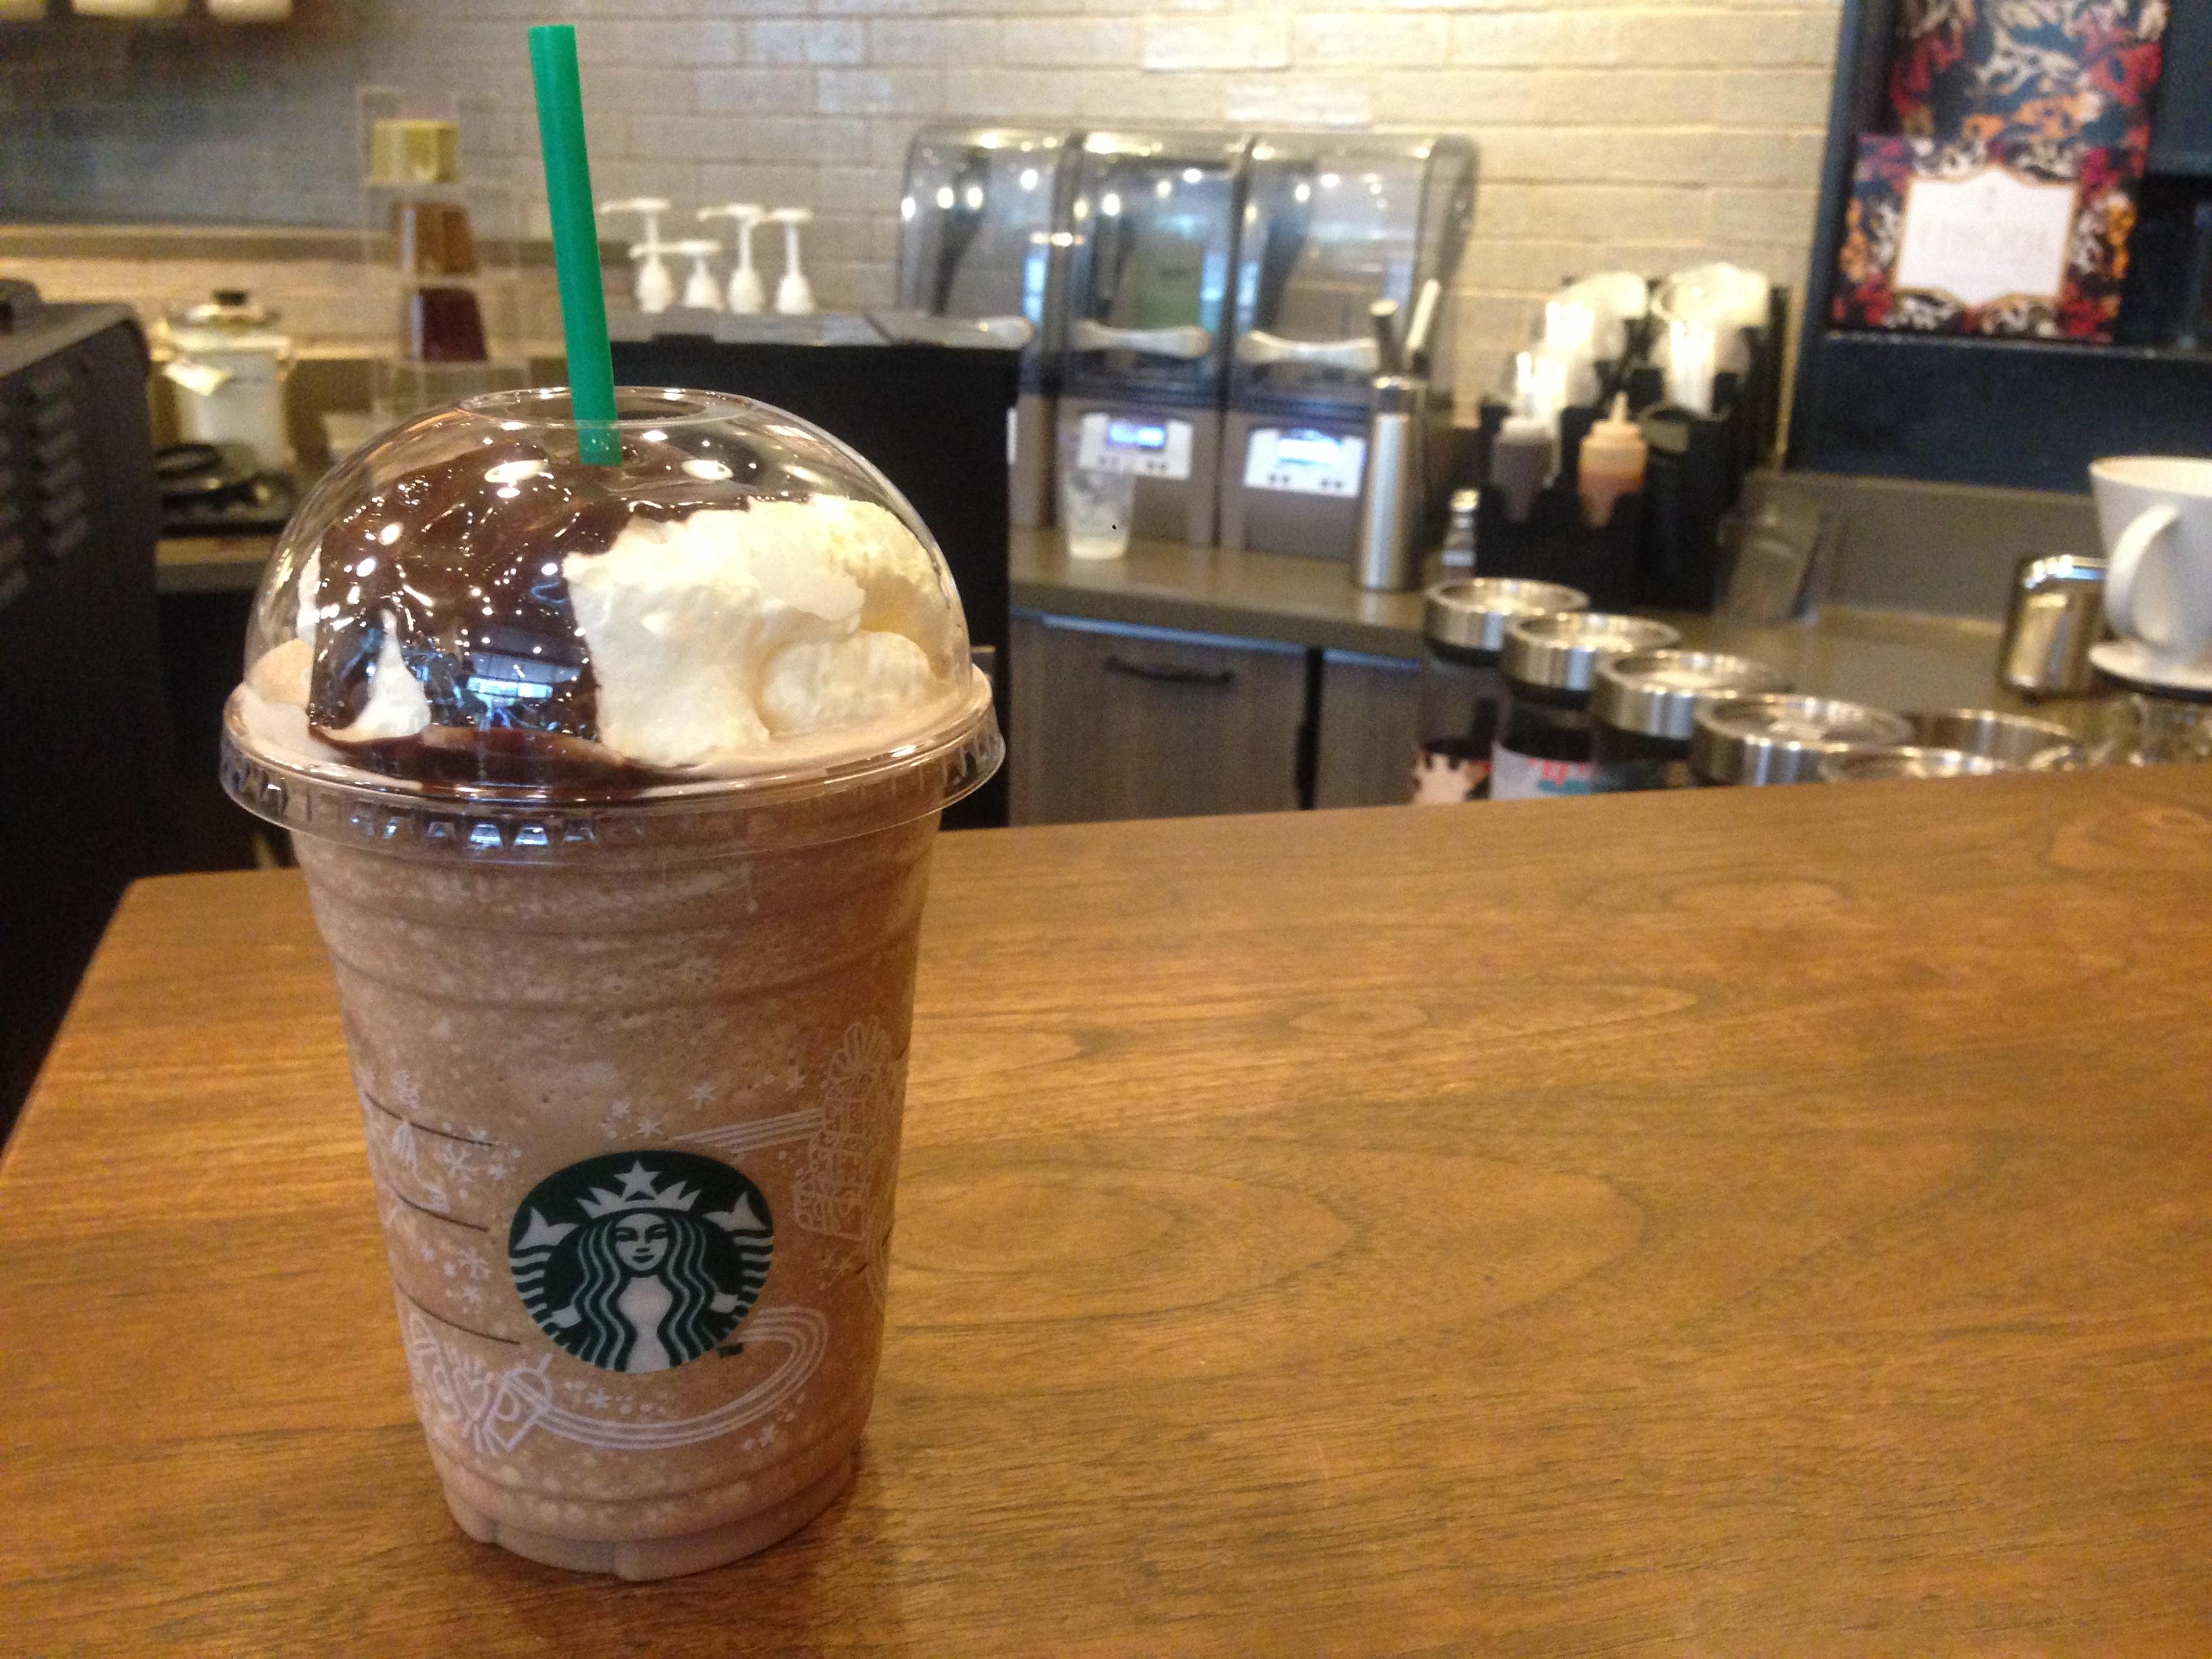 Mocha Frappuccino by Starbucks